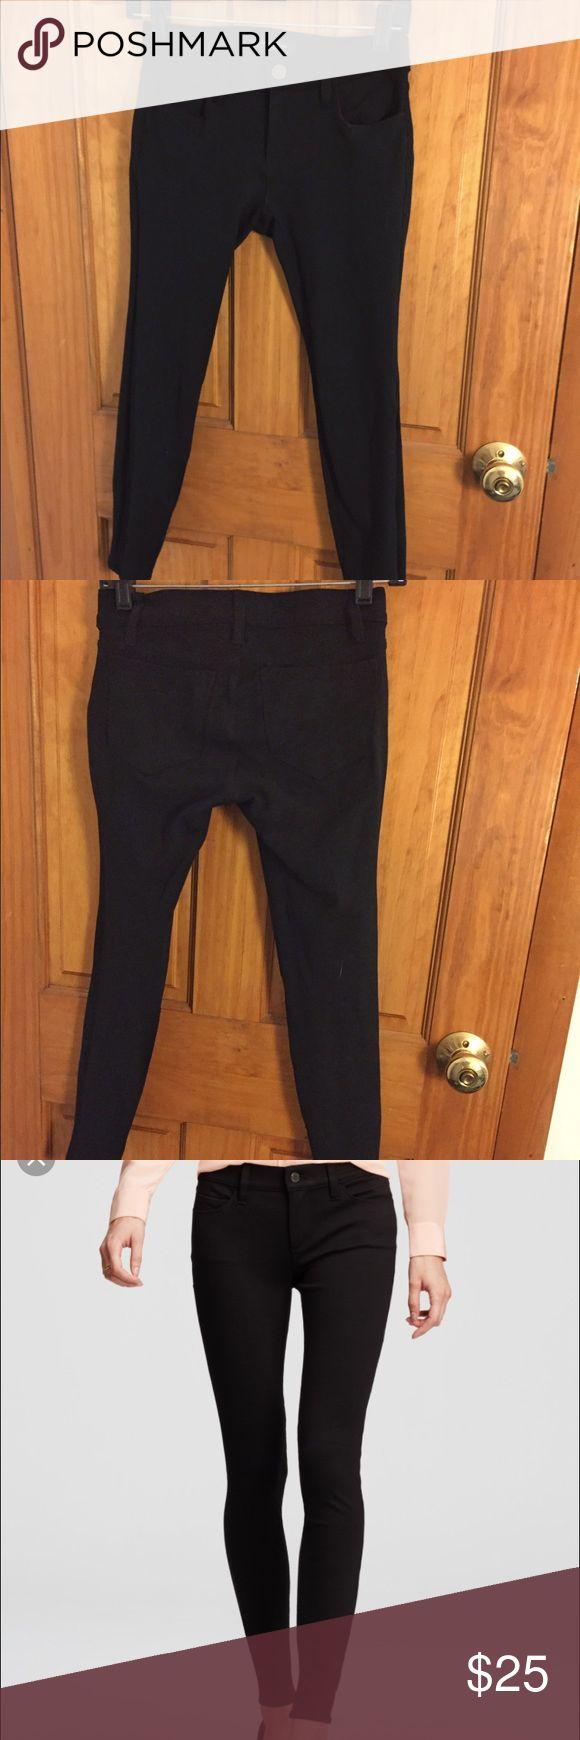 "Ann Taylor Devin Ponte Super Skinny Pants Gorgeous pair of ponte pants. Comfortable. Ankle-length. Like leggings but a bit more ""professional."" Ann Taylor Pants Skinny"